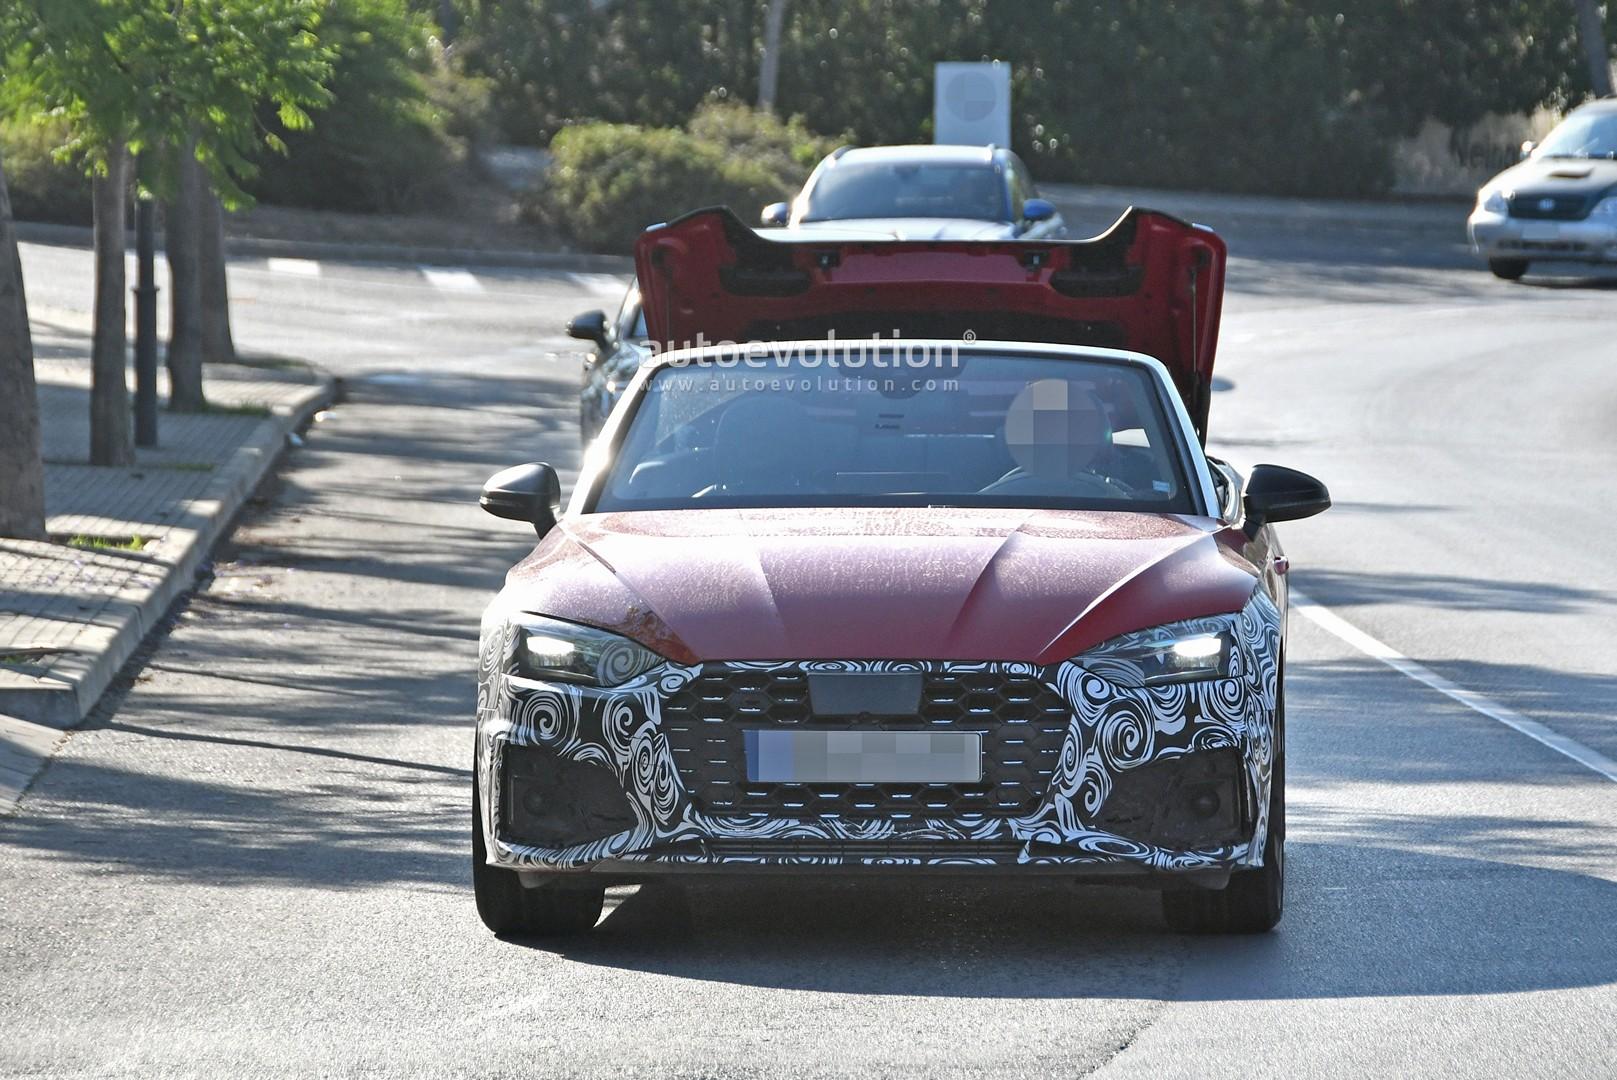 2021 Audi Rs5 Cabriolet Exterior and Interior